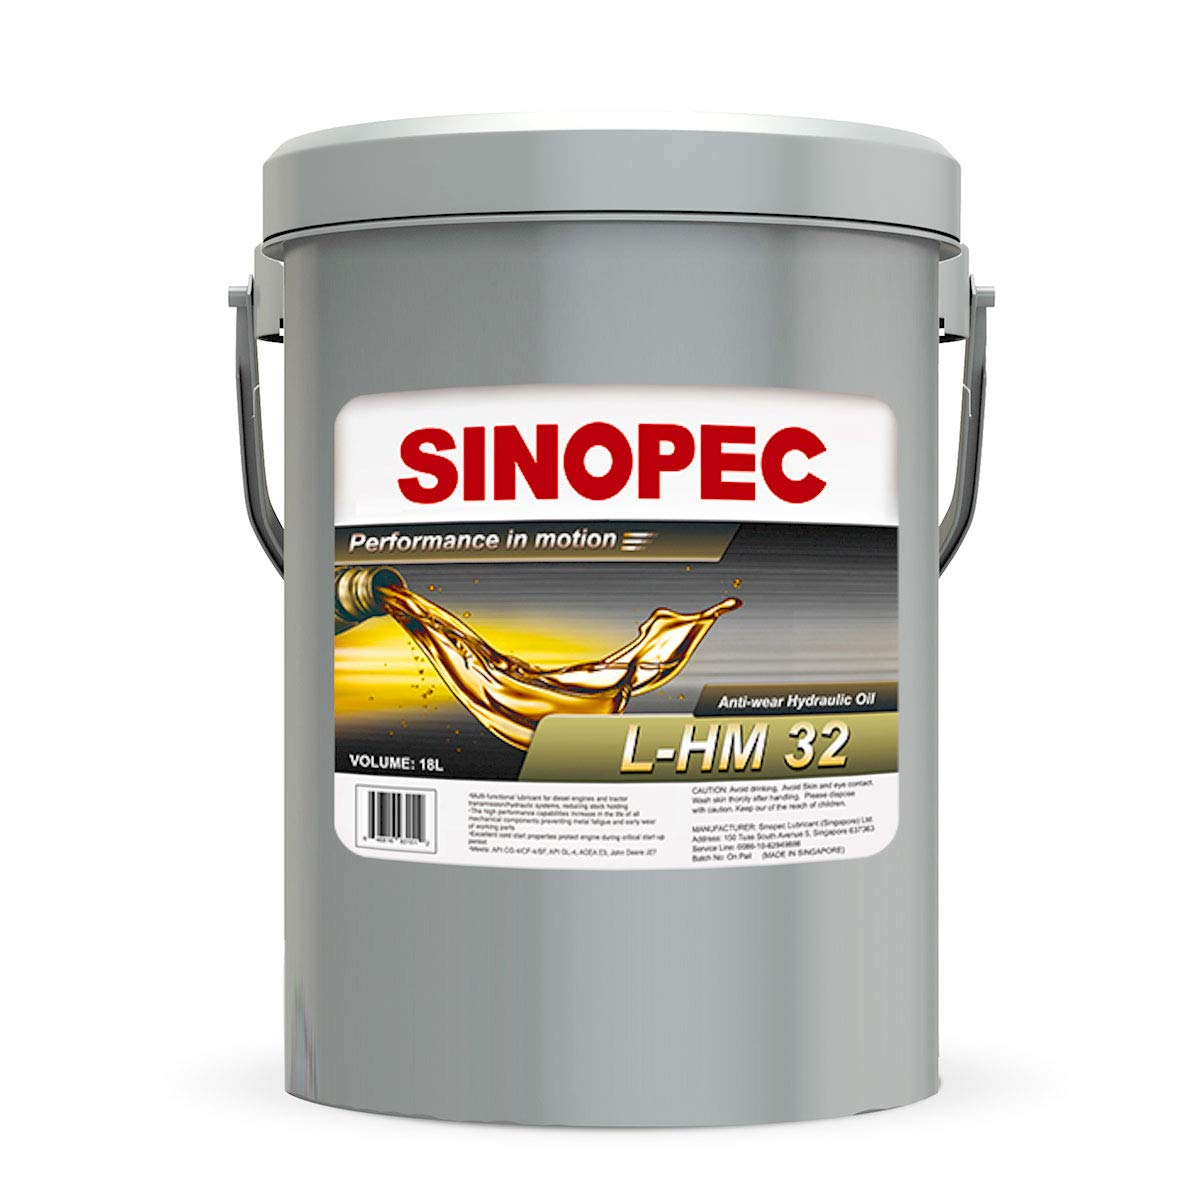 Amazoncom Sinopec Aw 32 Hydraulic Oil Fluid Iso Vg 32 Sae 10w